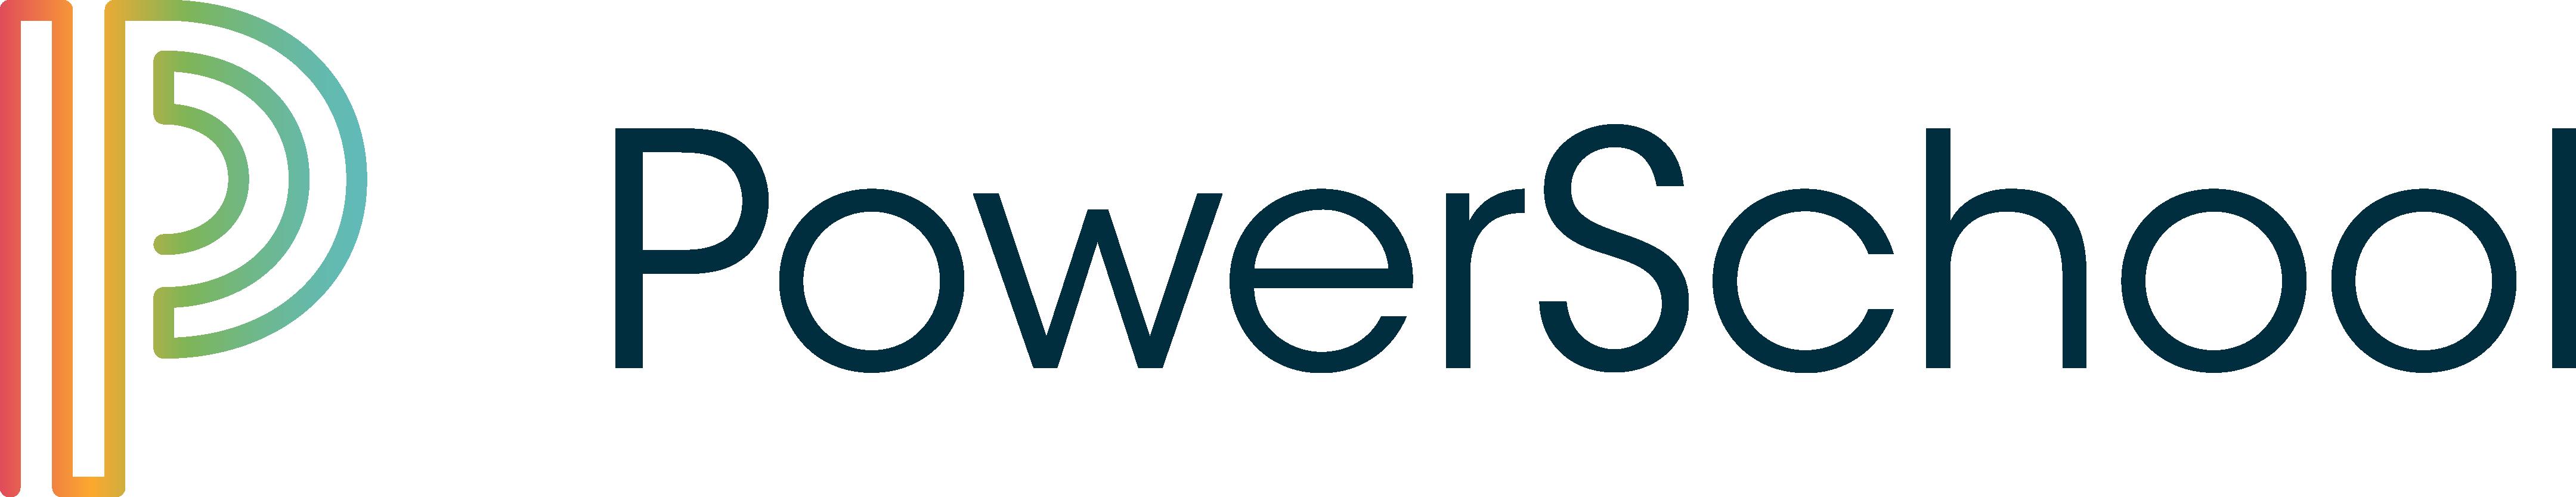 powerschool expands k 12 platform by acquiring tienet